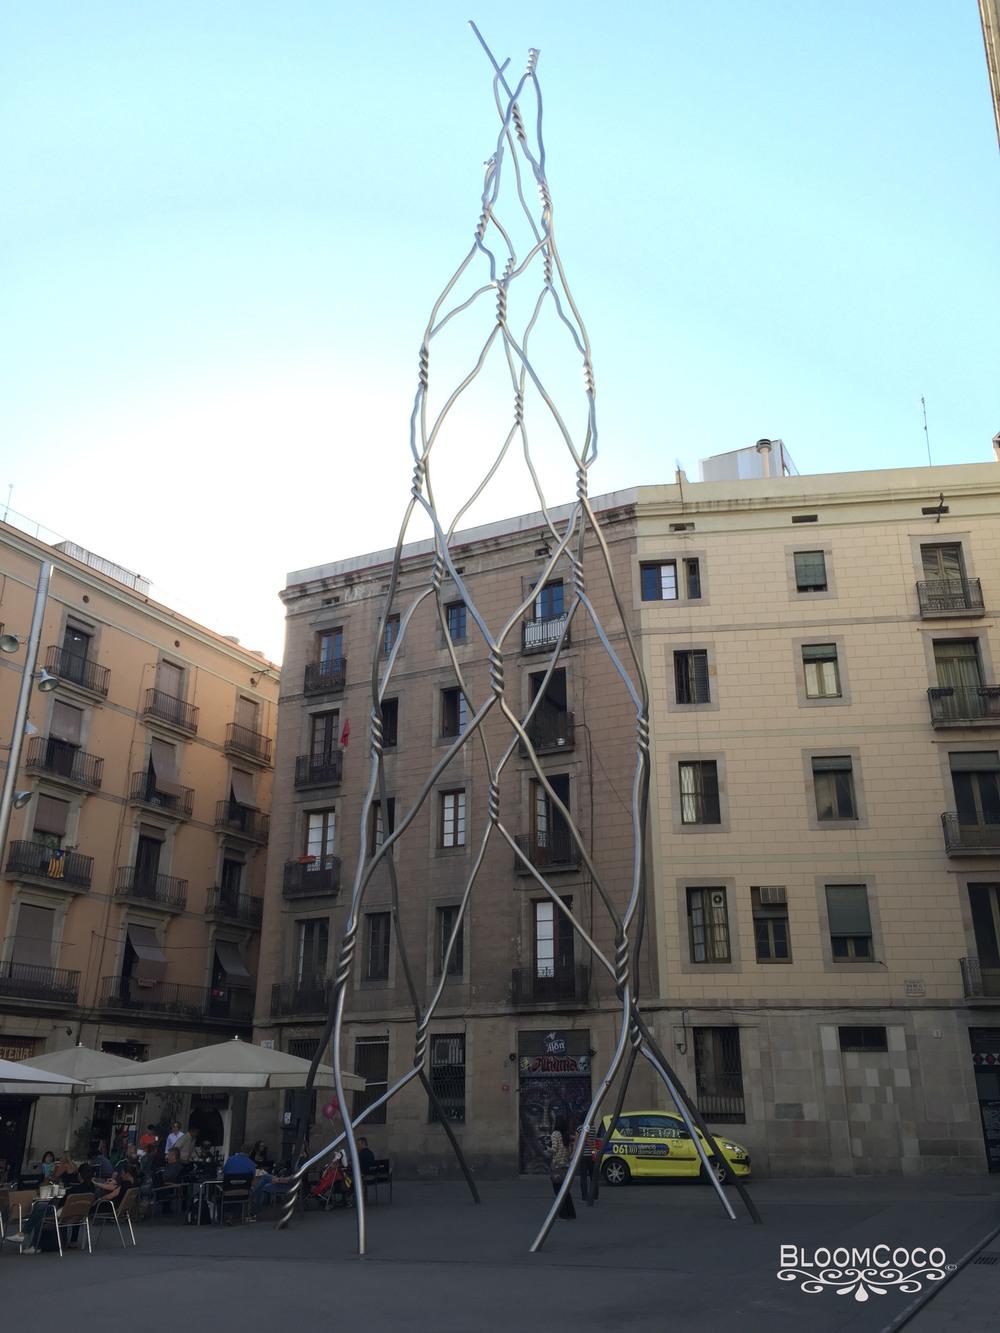 Barcelona20.jpg